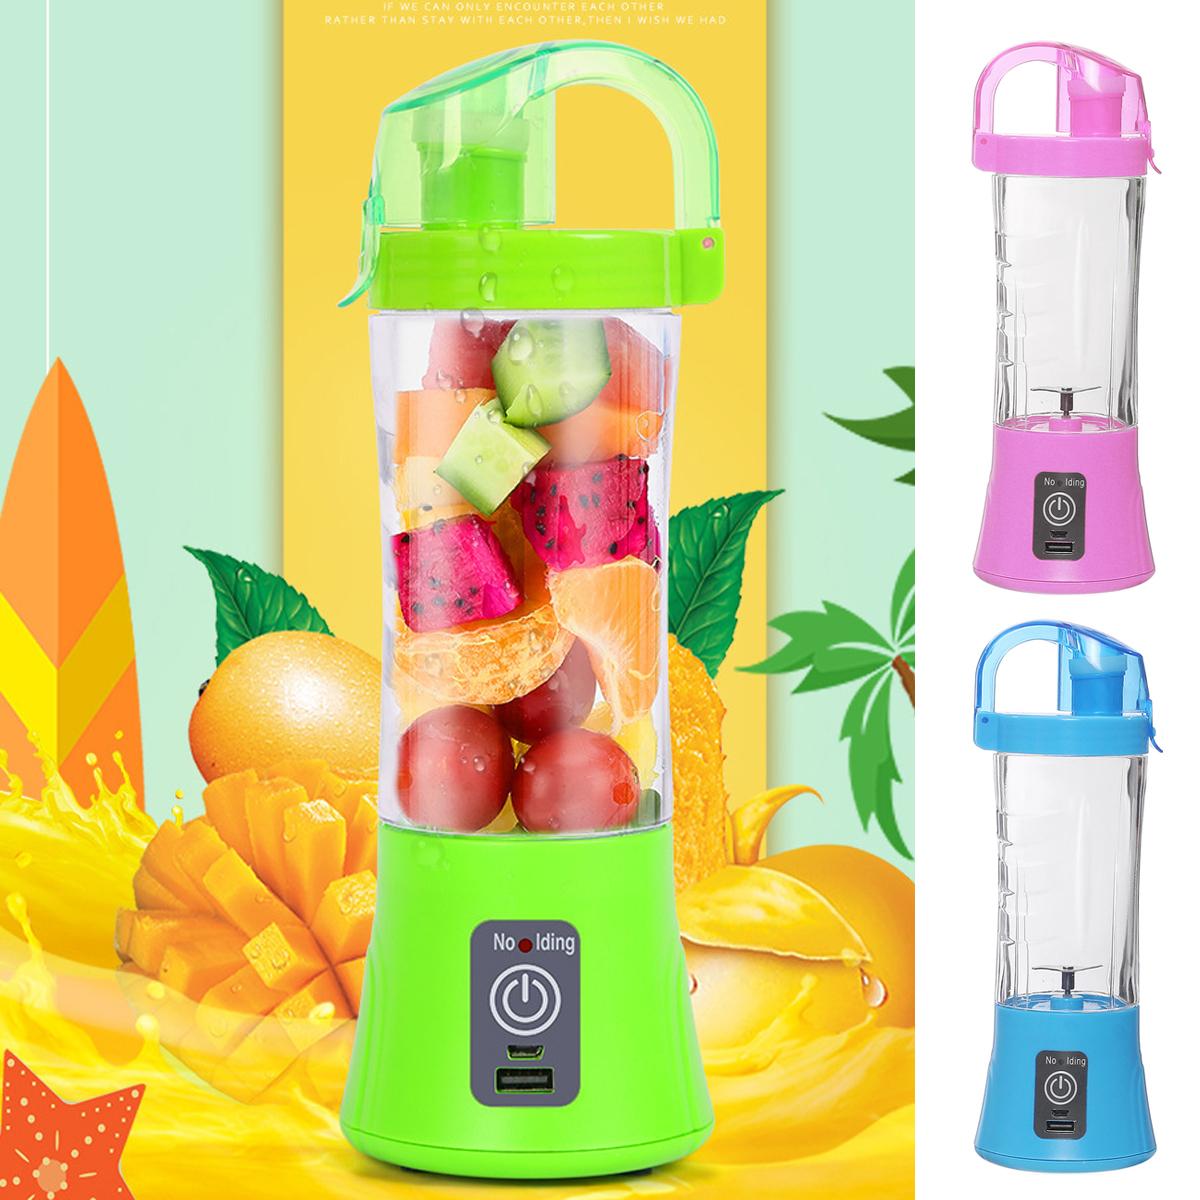 USB Rechargeable Battery Portable Juicer Maker Juice Cup Juice Blender 400ml HOT